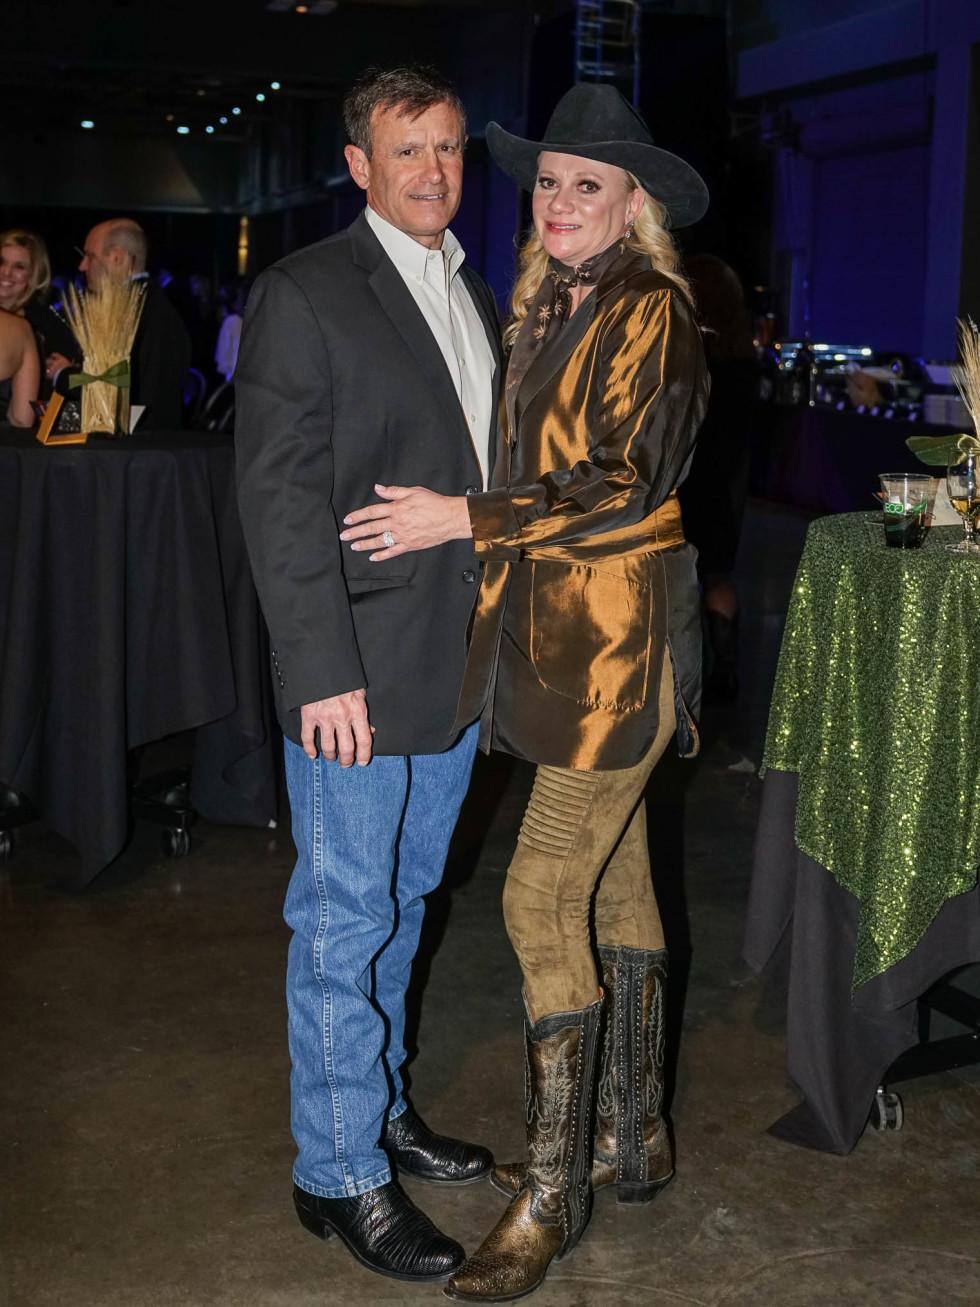 Austin Rodeo Gala 2018 Fashion Steve Stiles Kelly Stiles